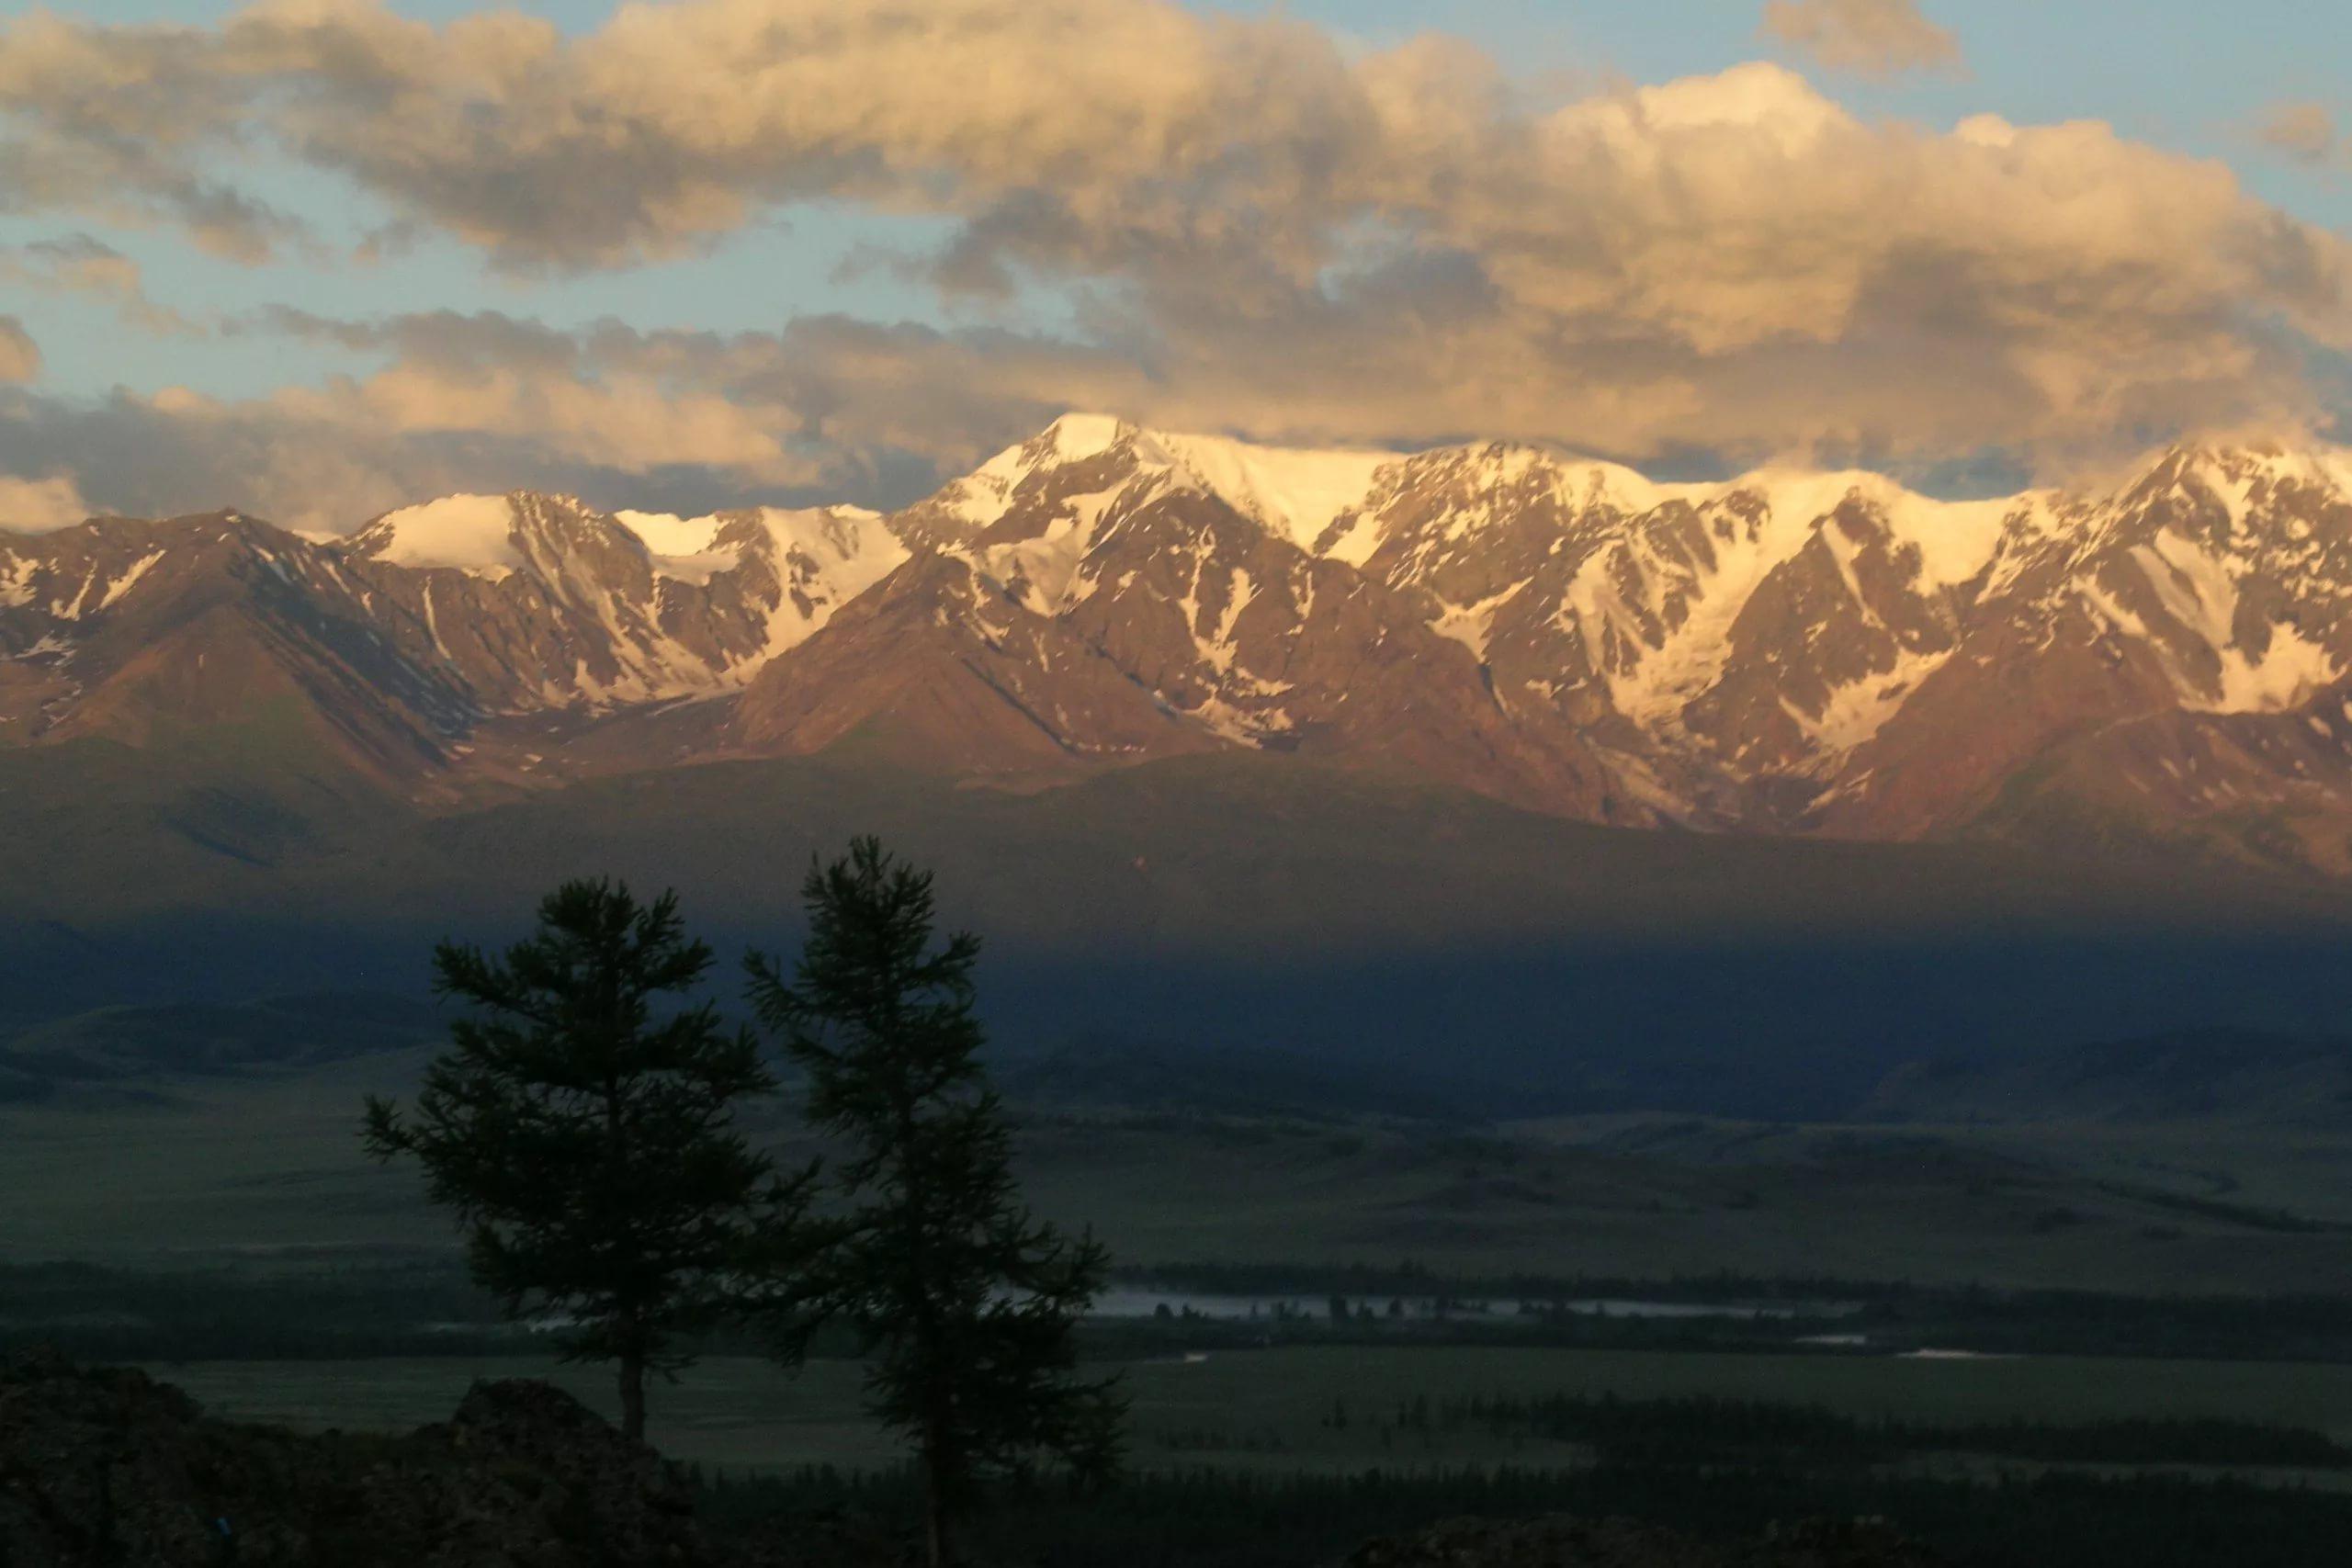 28 - 10 locais no Altay que vale a pena visitar